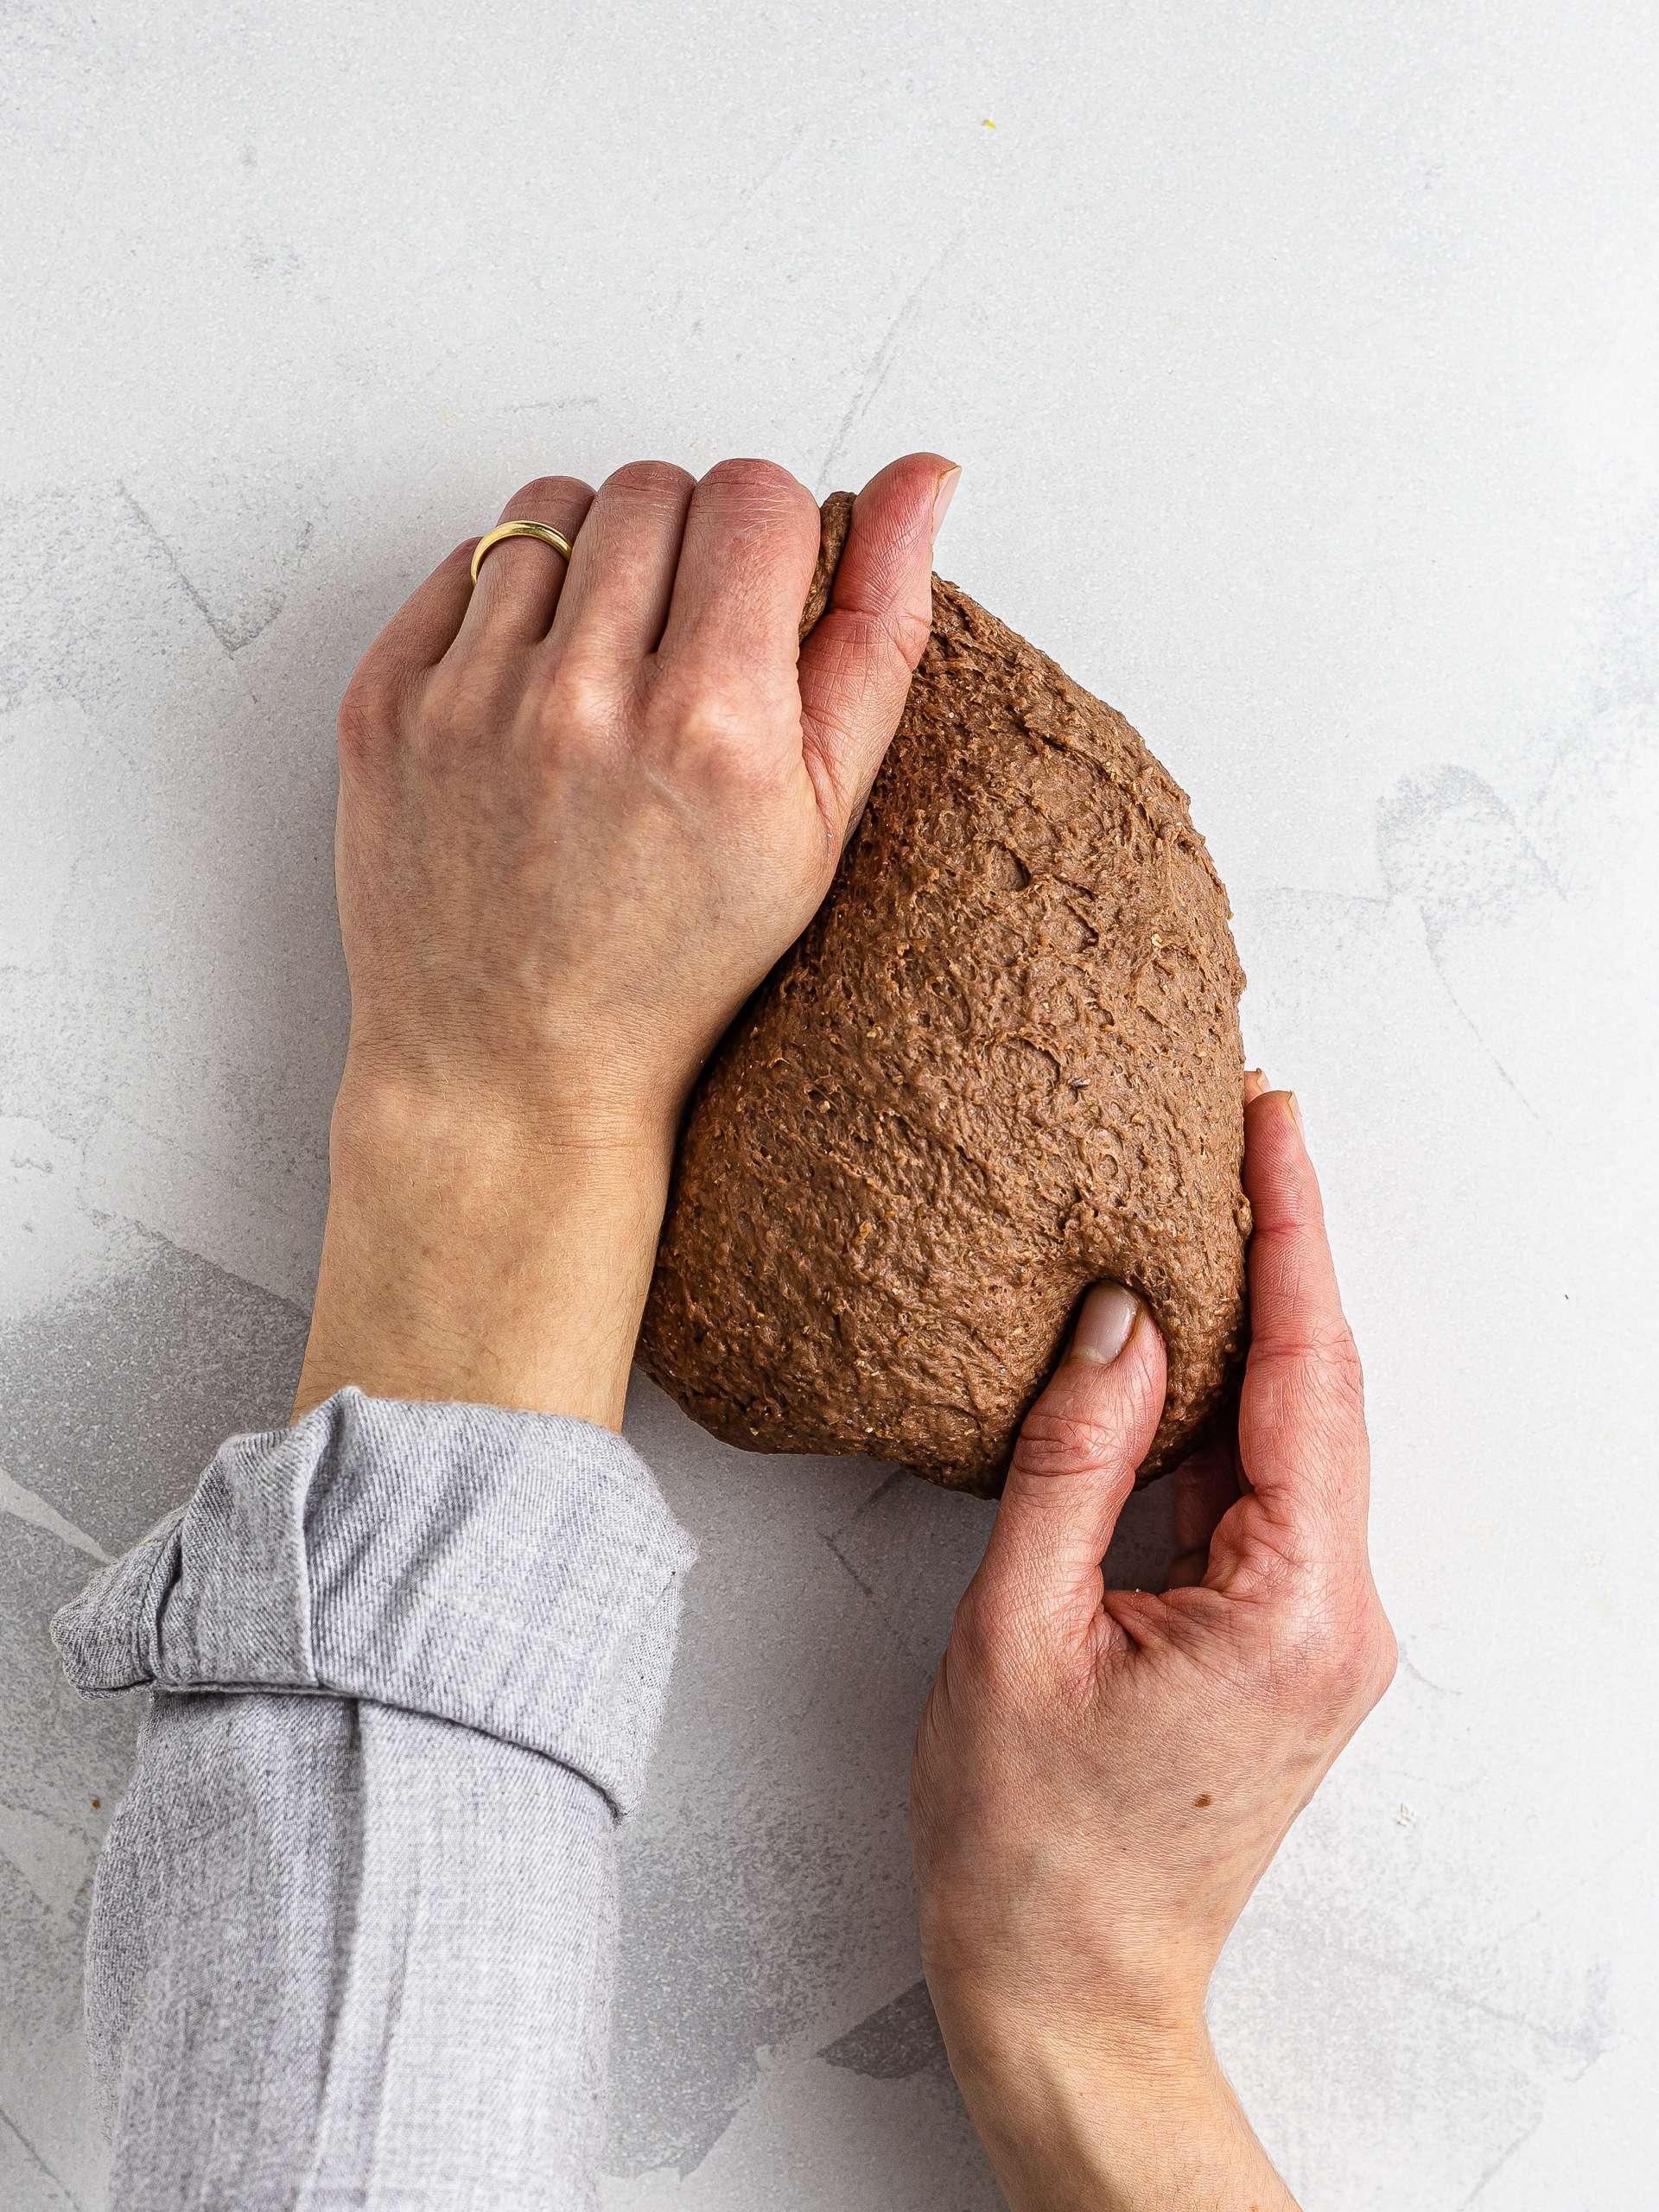 kneading the vegan cannoli shell dough